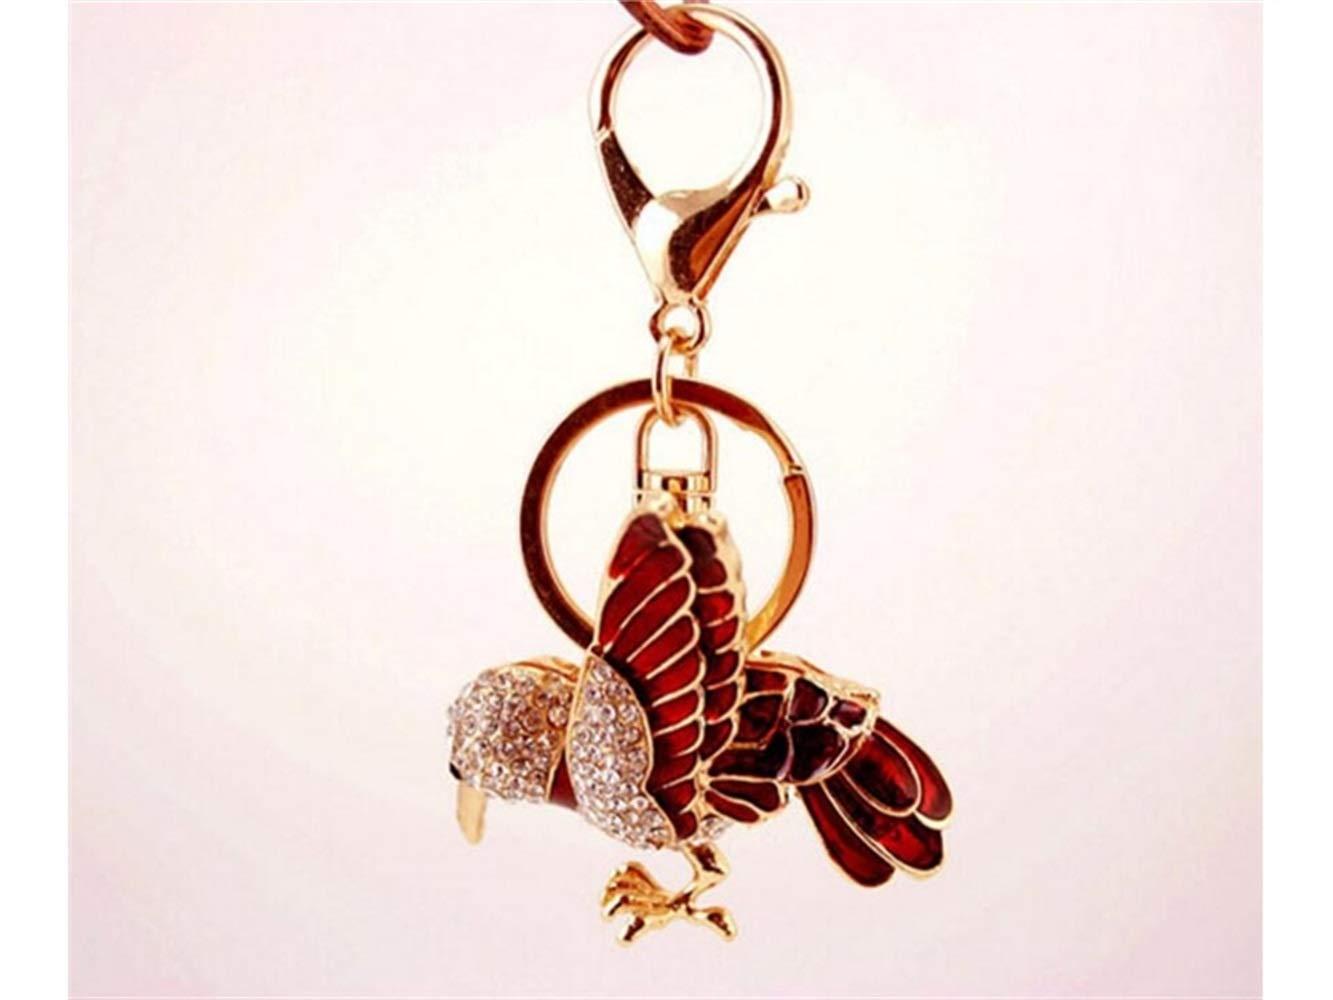 Car Keychain, Shiny Rhinestone Flying Bird Keychain Animal Shape Key Trinket Car Bag Key Holder Decorations(Red) for Gift